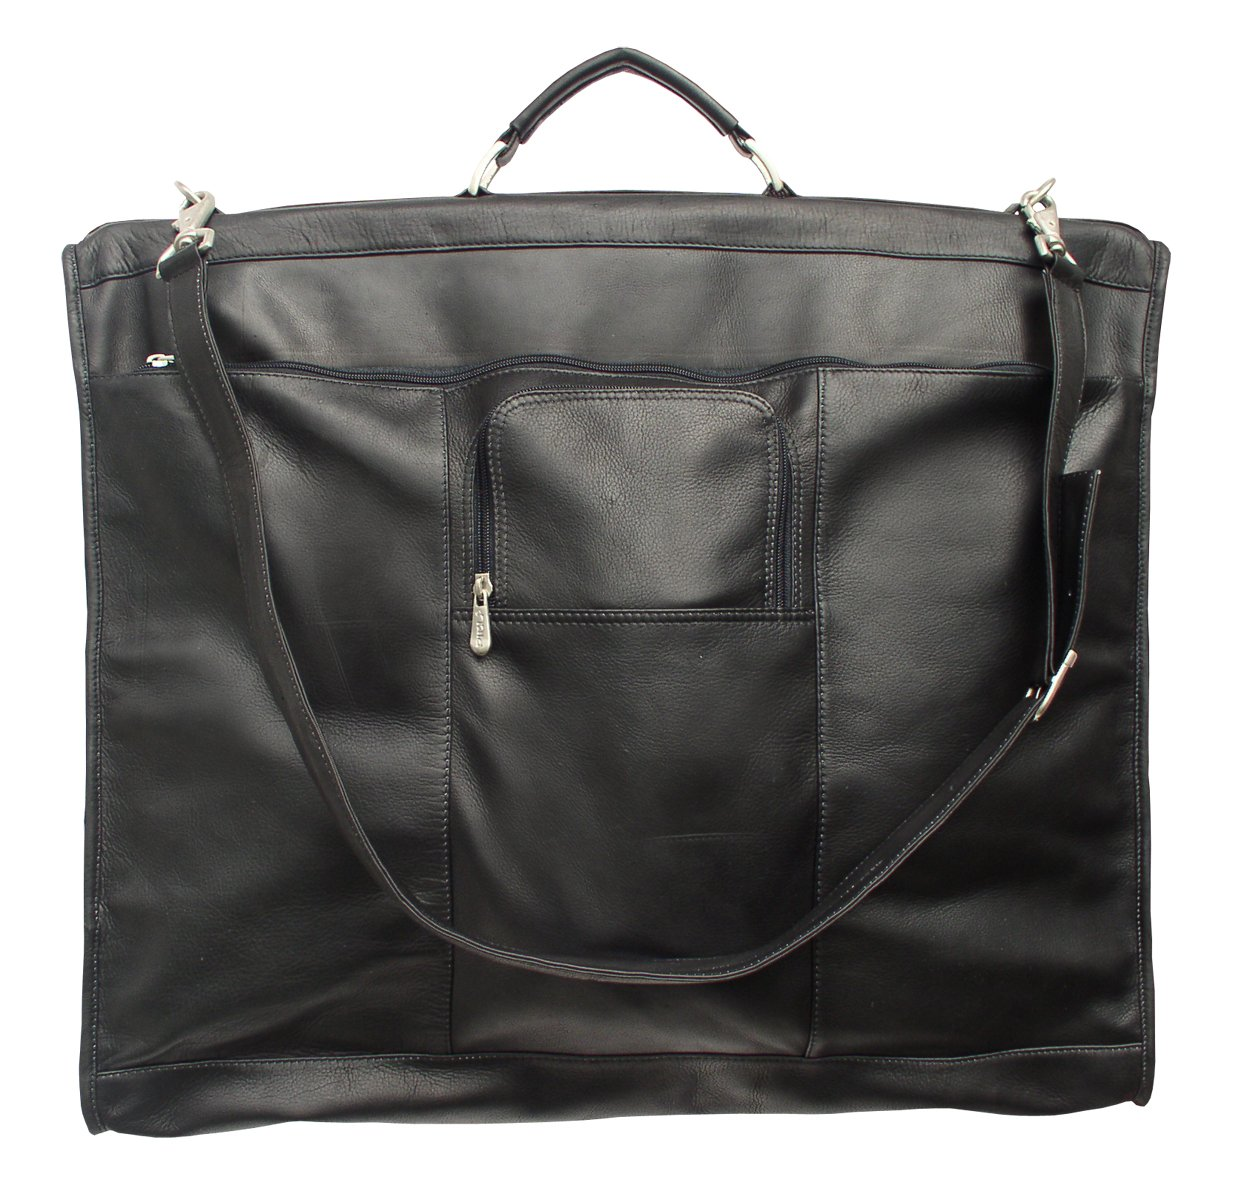 Piel Leather Traveler 40'' Elite Garment Carrie in Black by Piel Leather